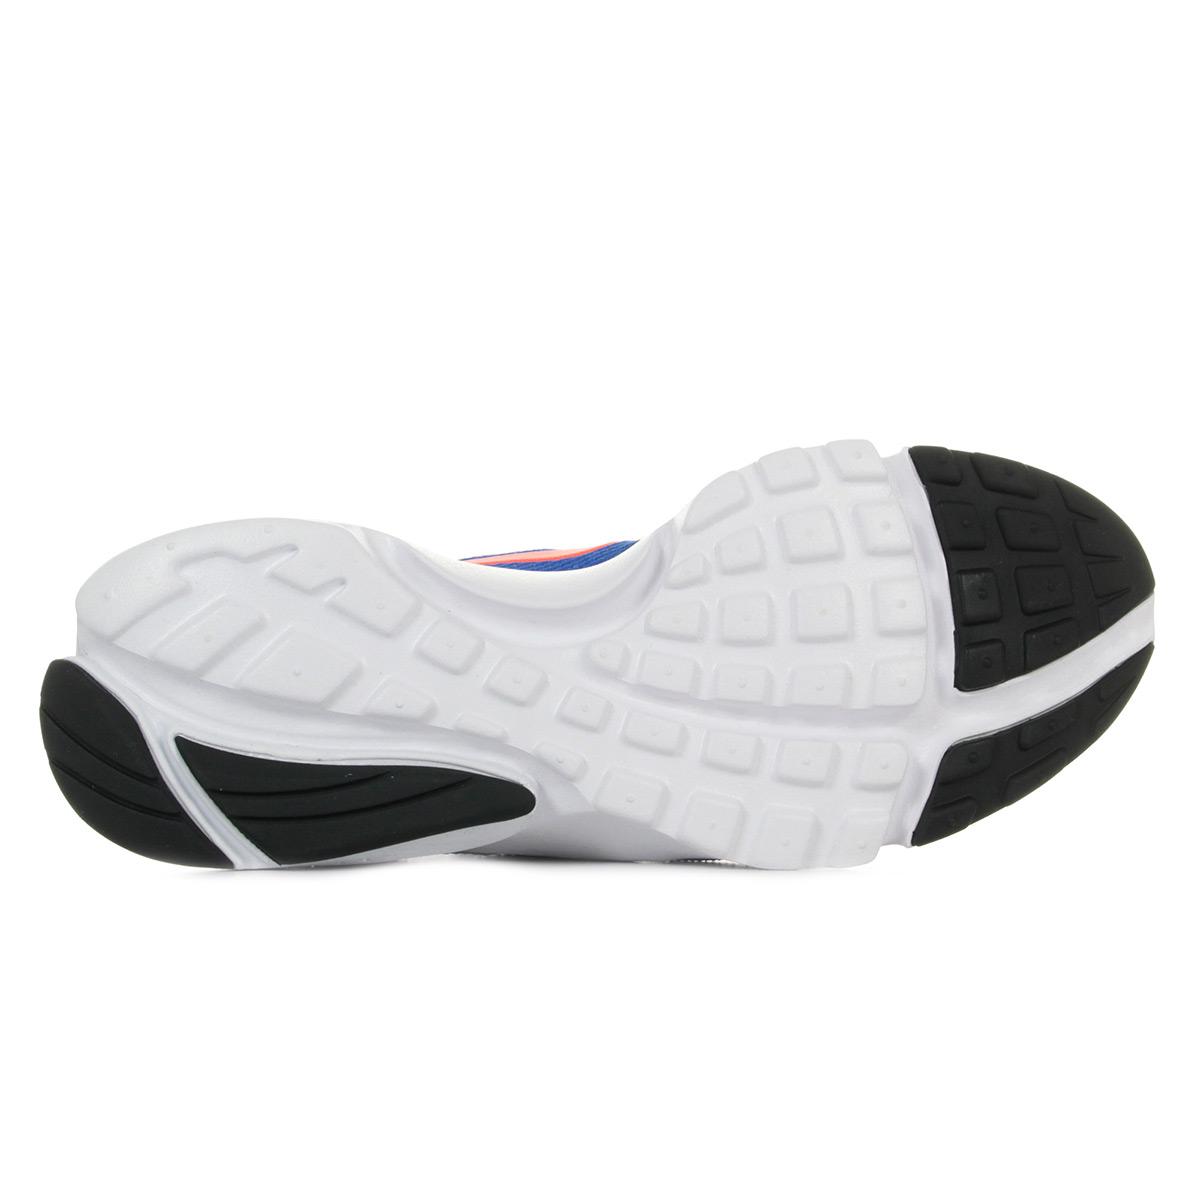 Nike Presto Fly 908019405, Baskets mode homme